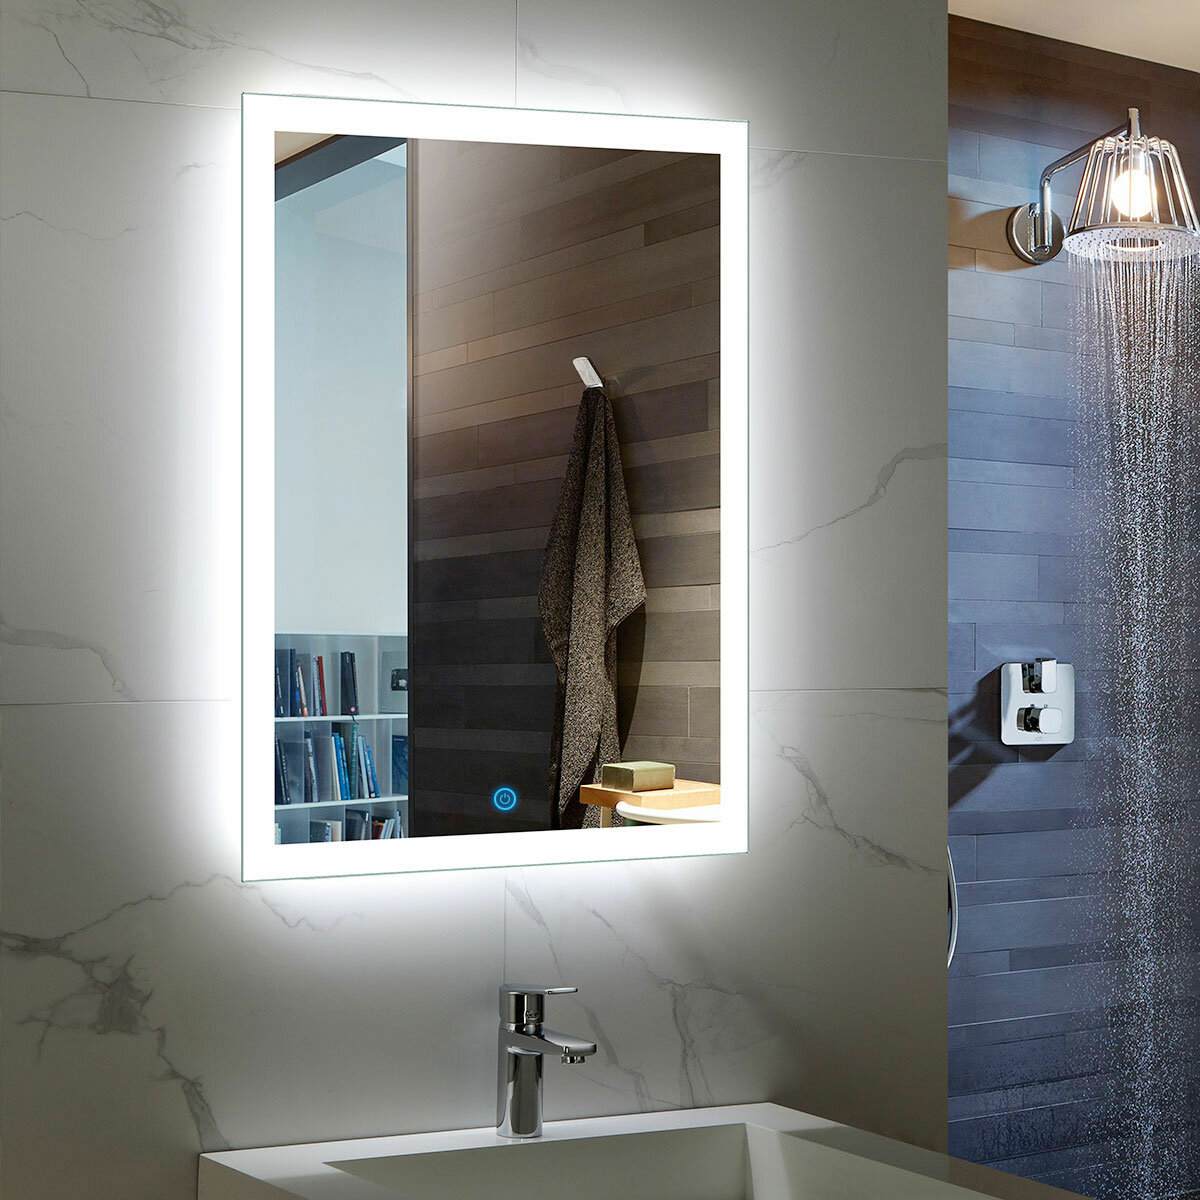 Ivy Bronx Albie Modern Contemporary Lighted Bathroom Vanity Mirror Reviews Wayfair